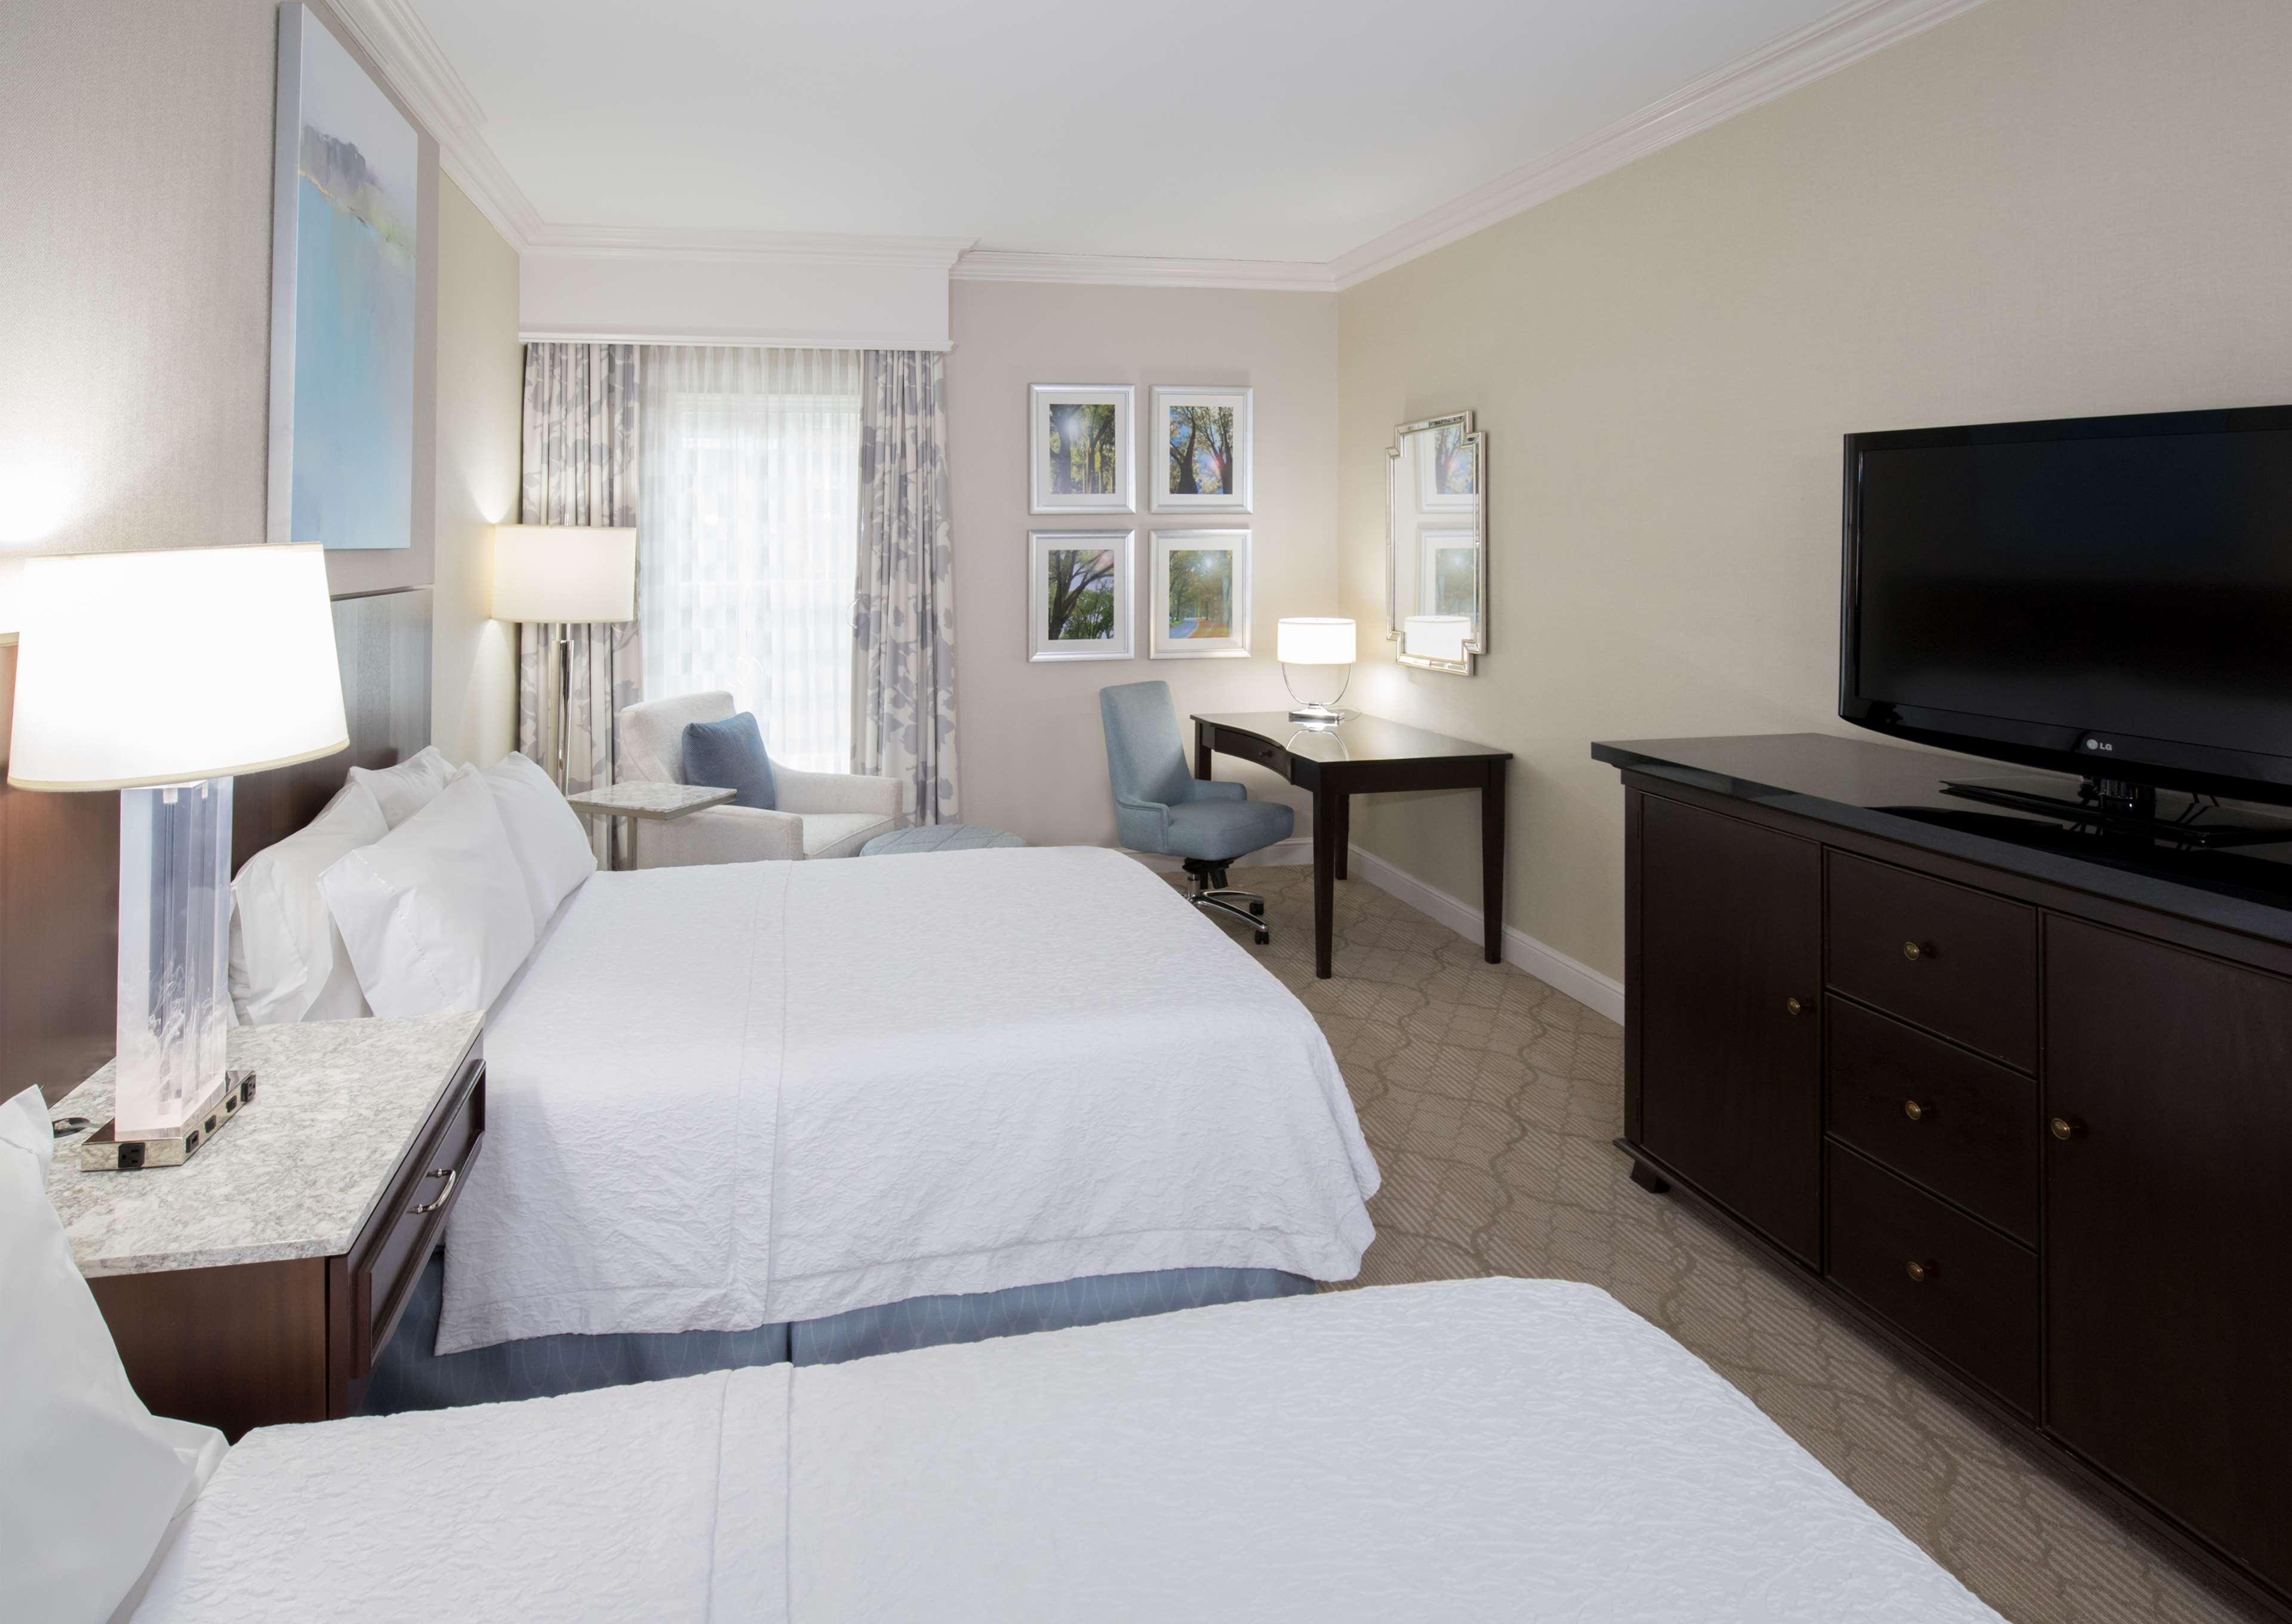 Hampton Inn & Suites Charlotte/South Park at Phillips Place image 33